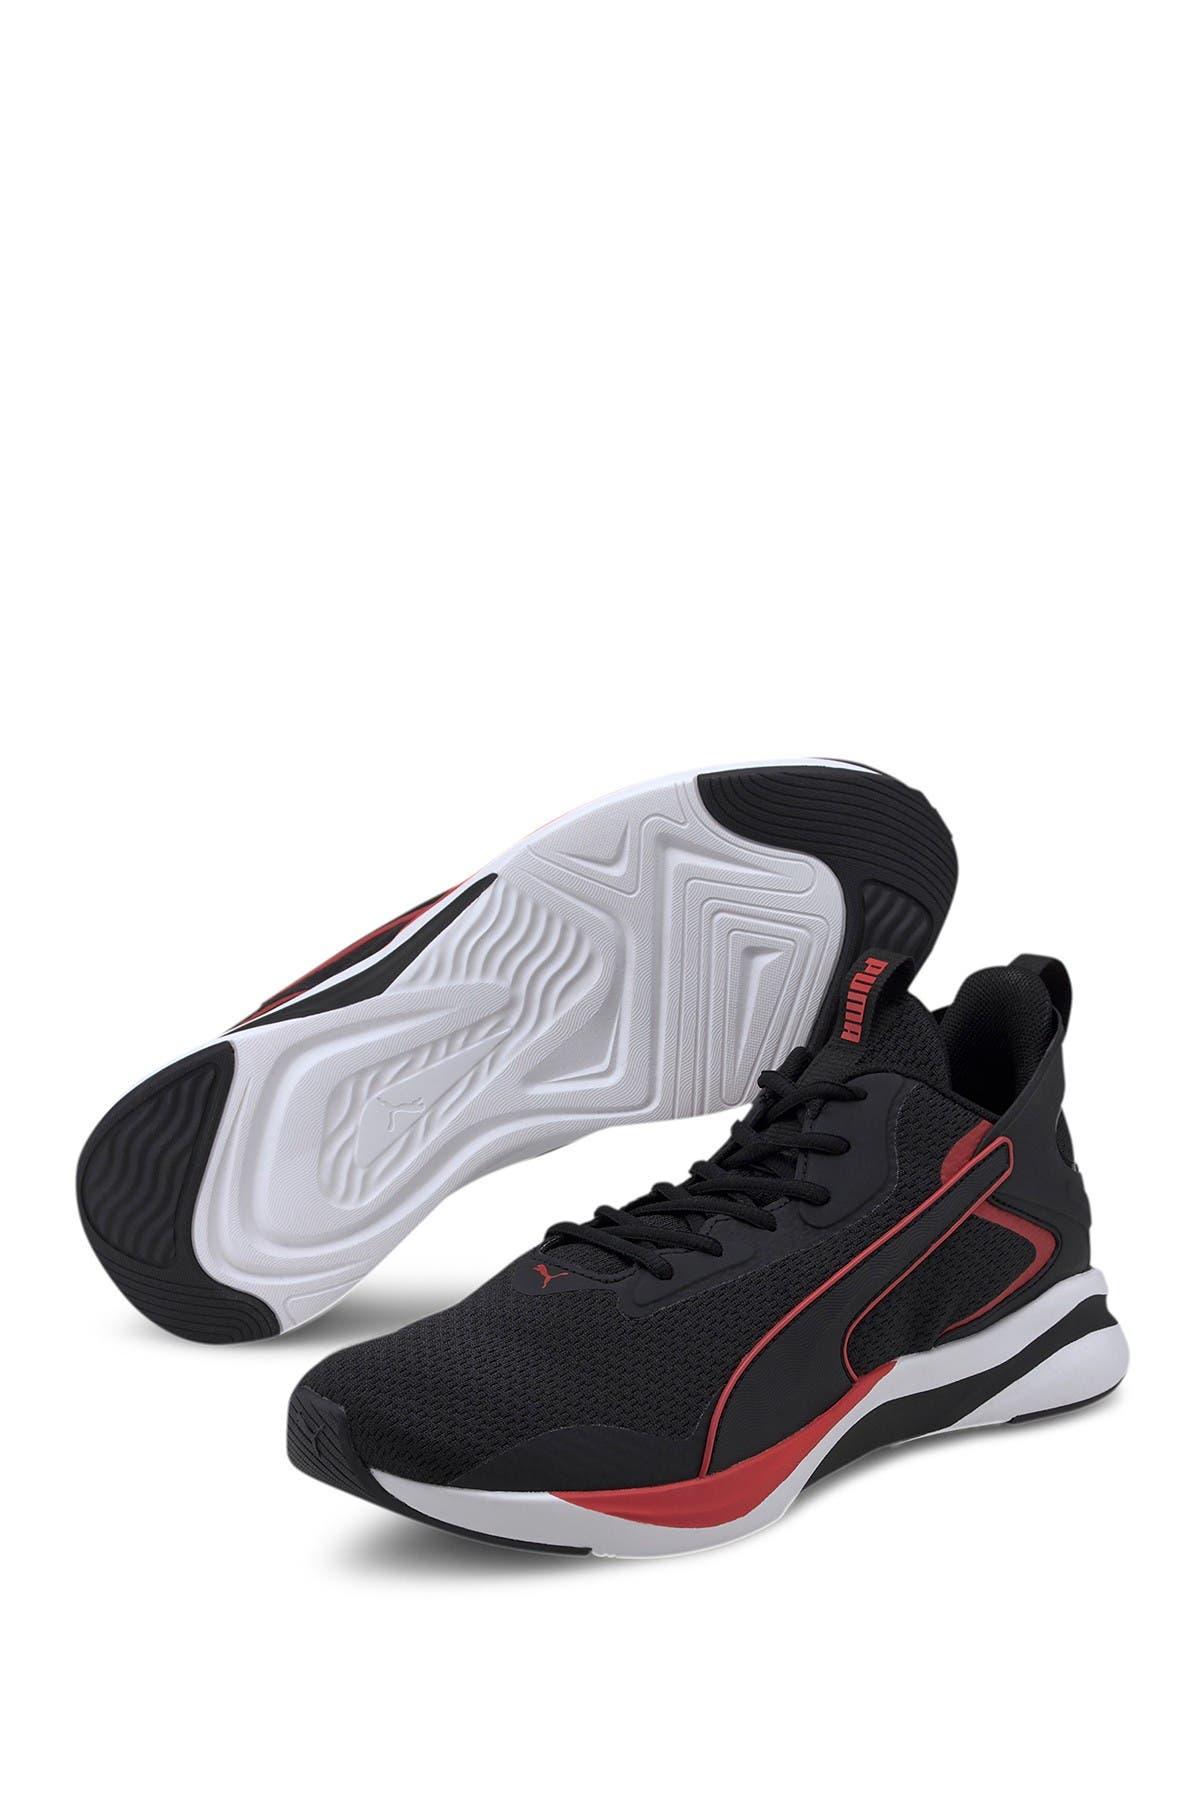 Image of PUMA SOFTRIDE Rift Tech Sneaker